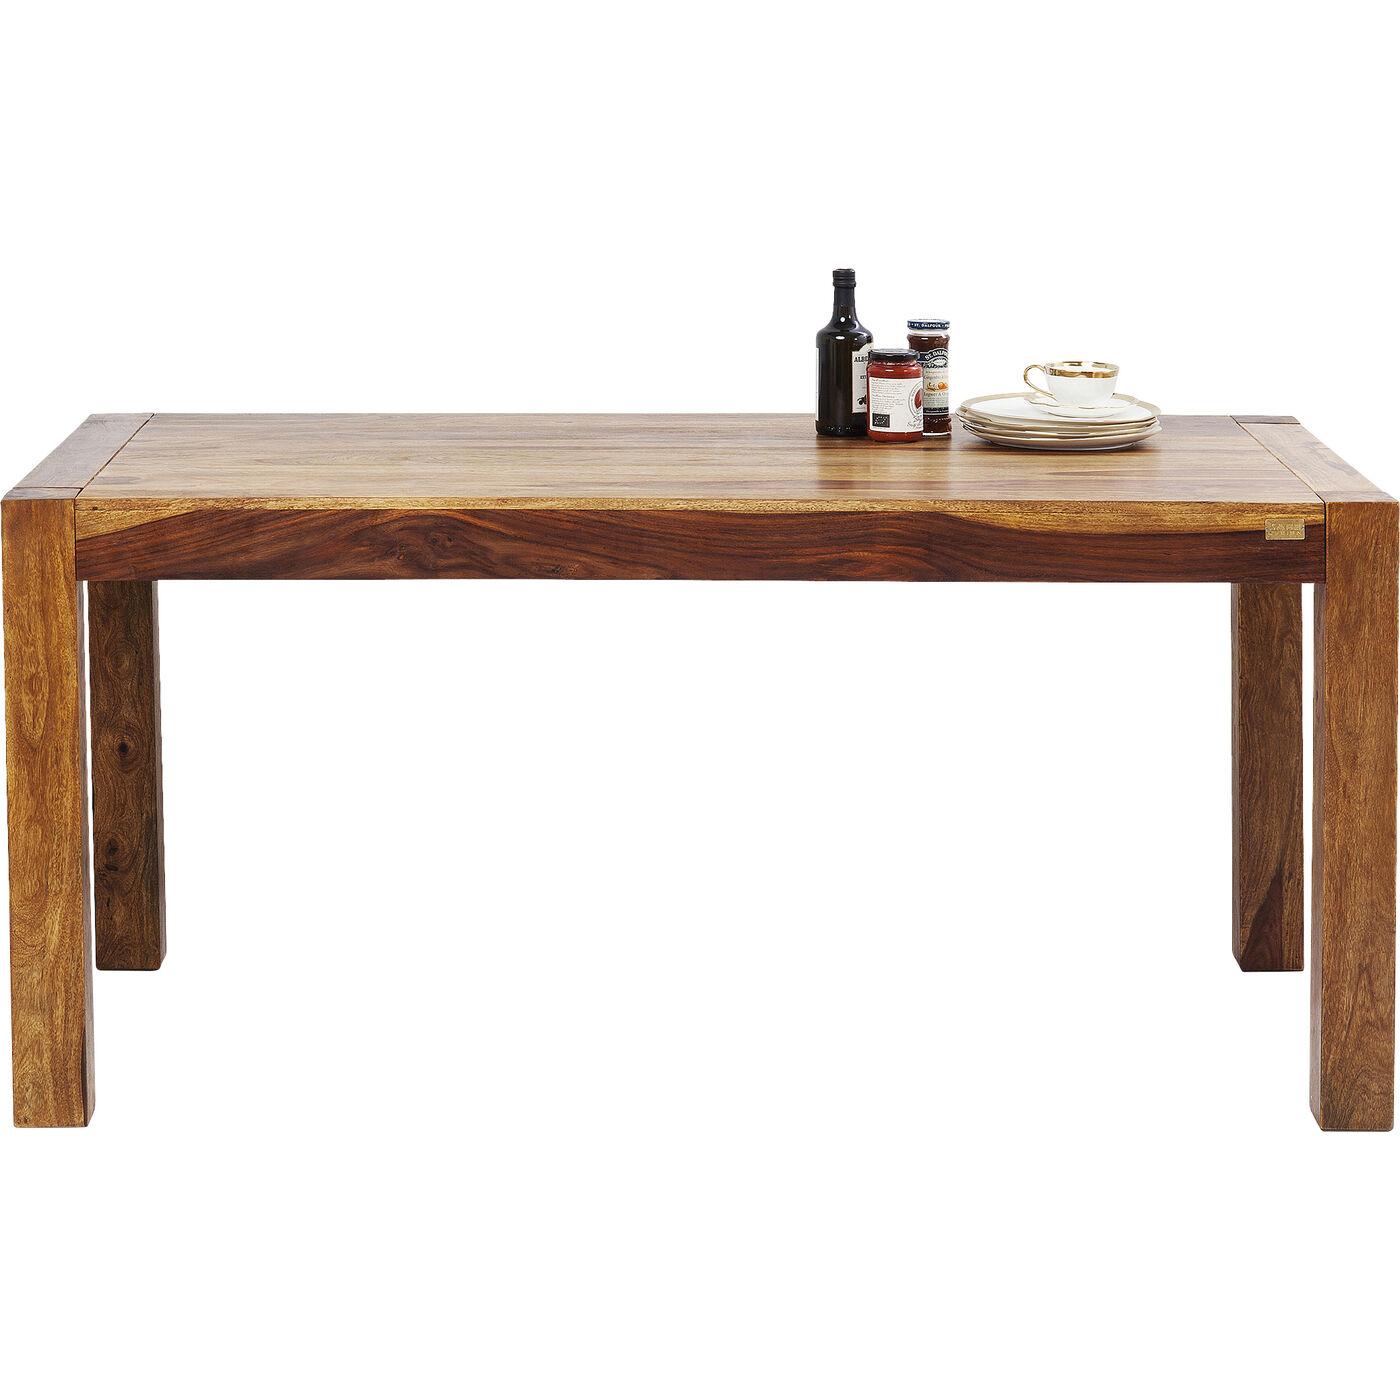 Authentico Tisch 200x100cm